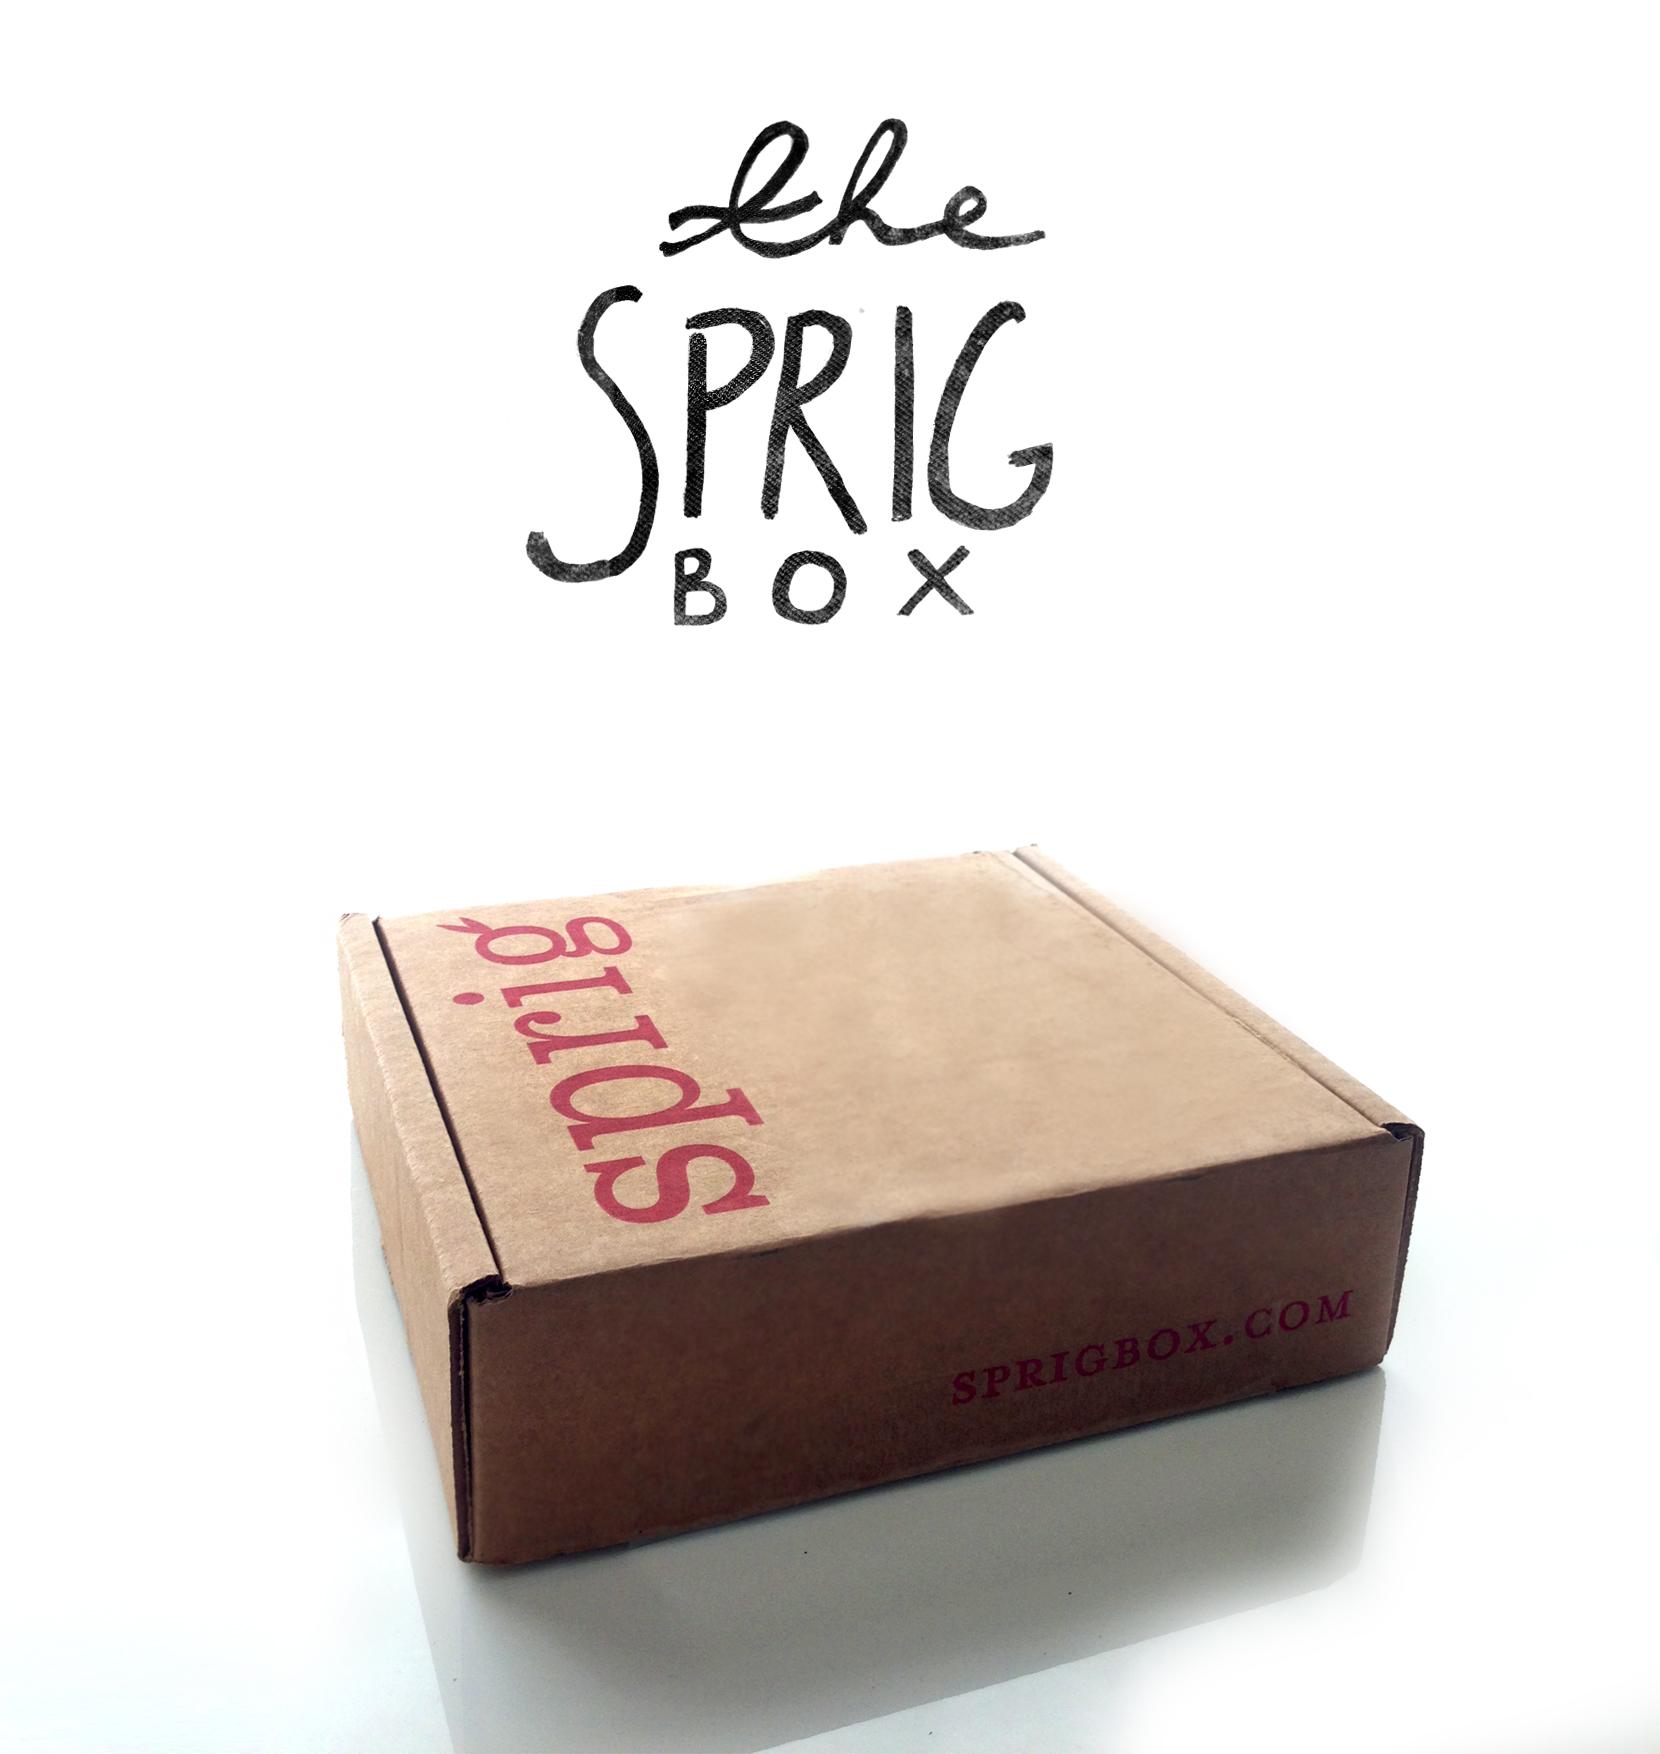 Sprig Box  |  The Fresh Exchange